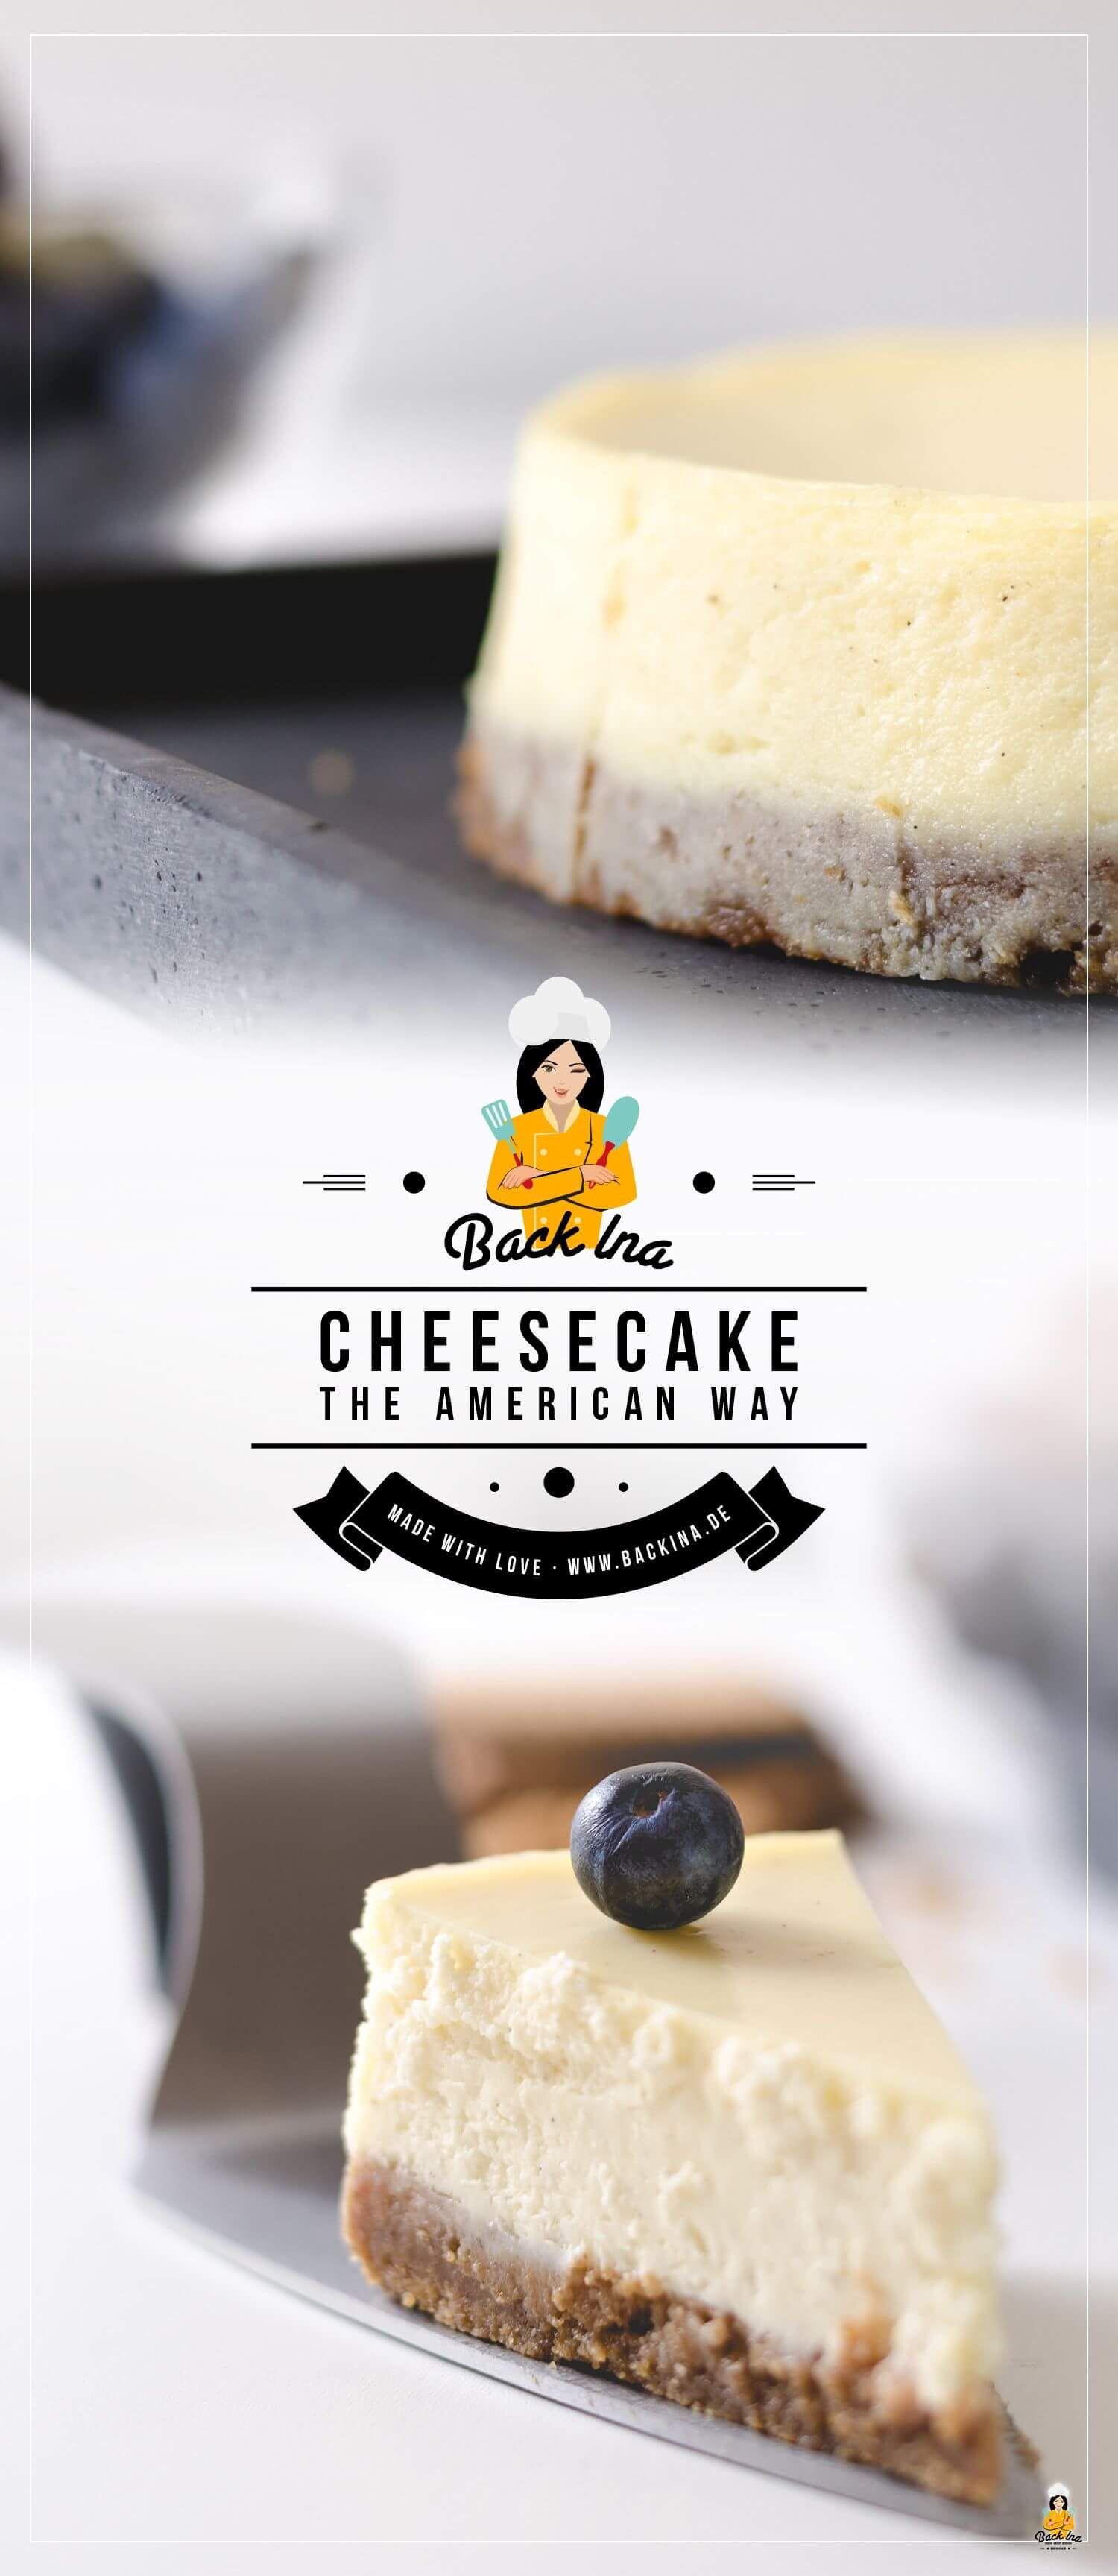 Cremiger American Cheesecake nach klassischer Art | BackIna.de